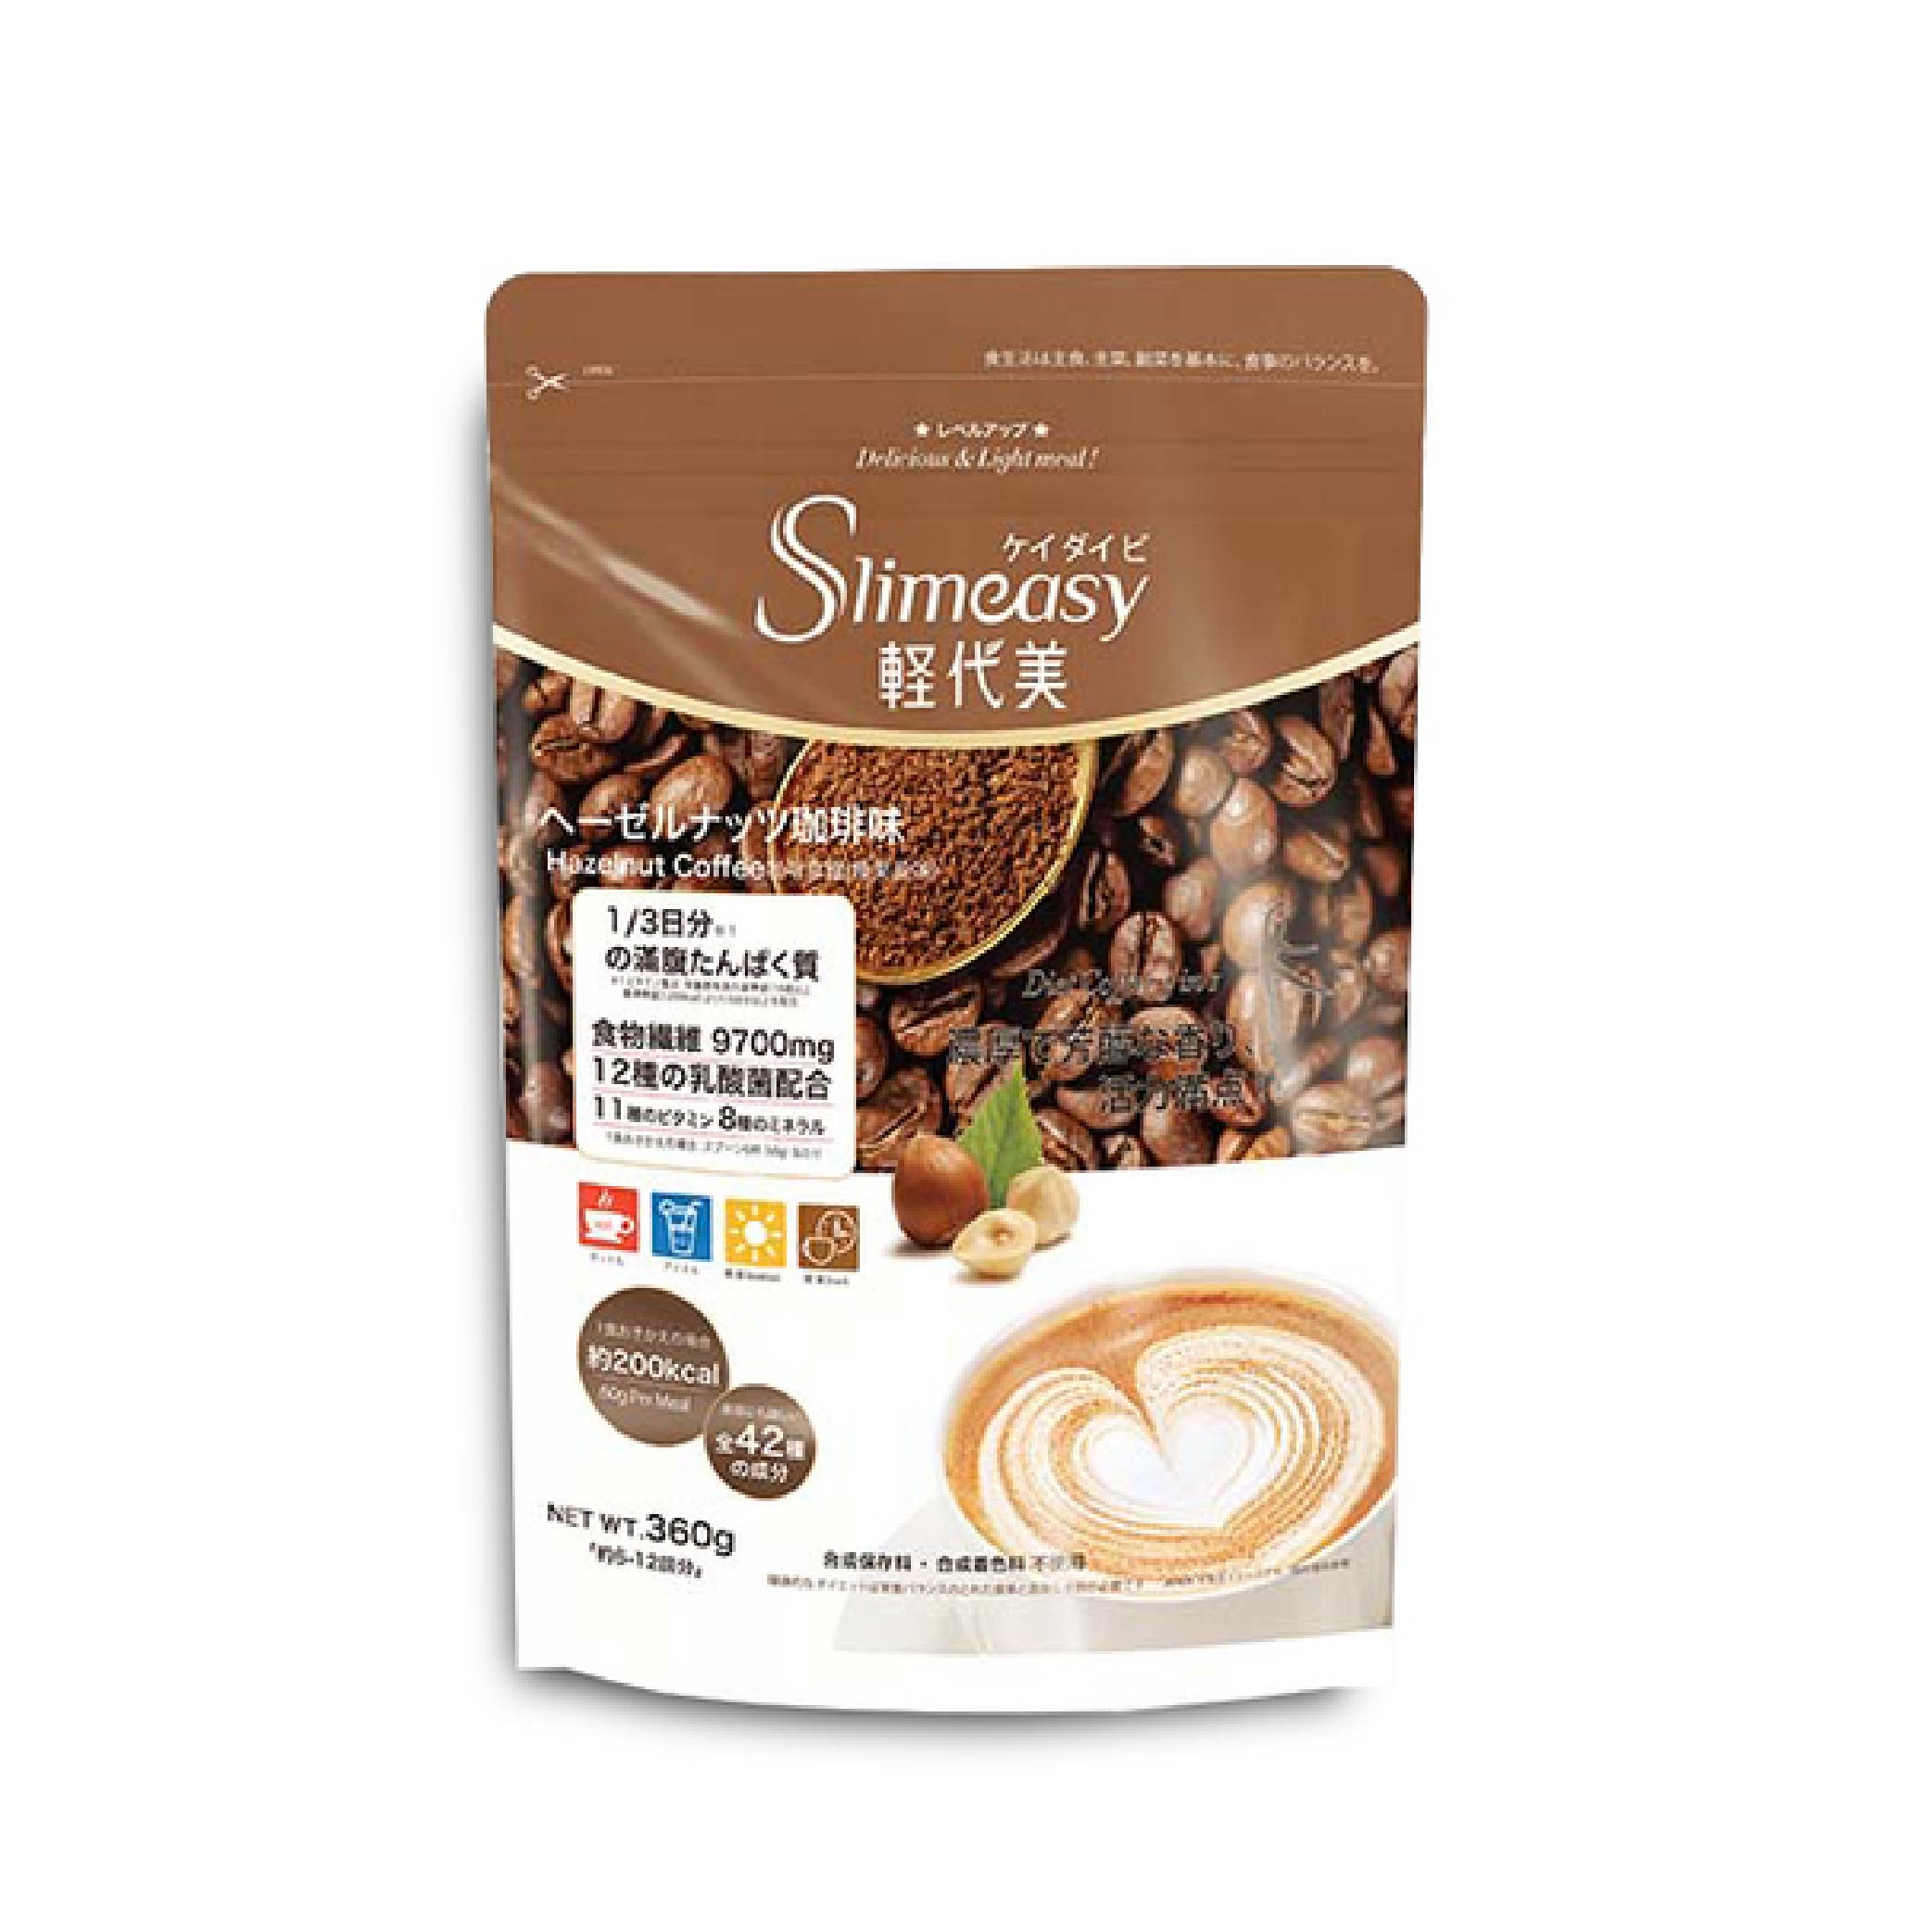 【Slimeasy輕代美】營養代餐 咖啡拿鐵榛果風味 家庭號(360g)